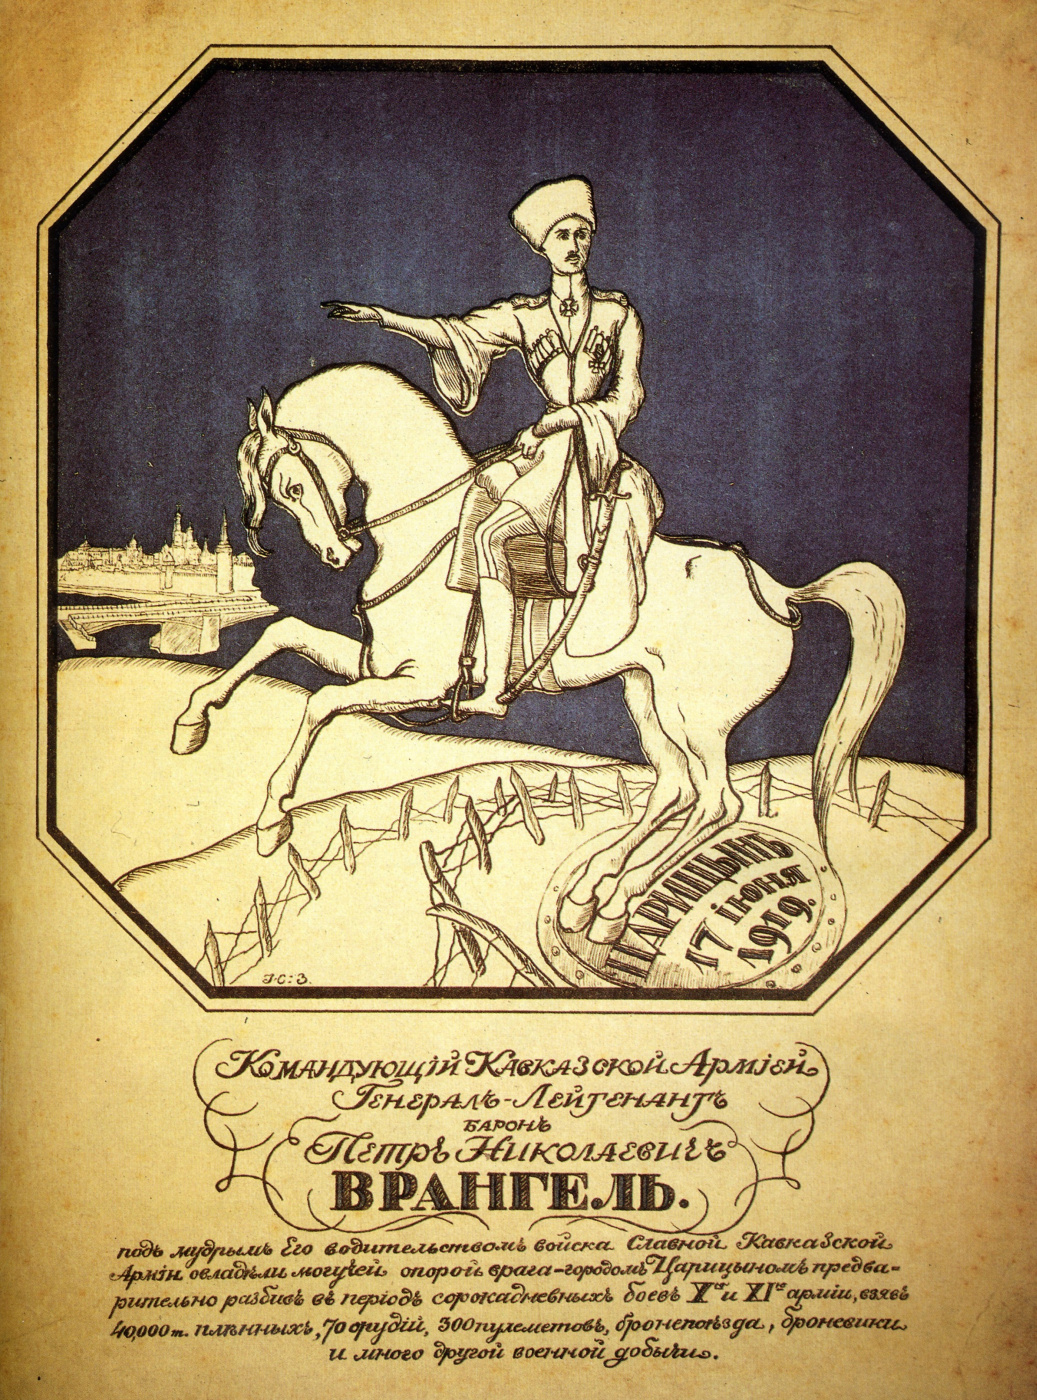 Unknown artist. Commander of the Caucasian Army. Lieutenant-General Baron Pyotr Nikolayevich Wrangel ...